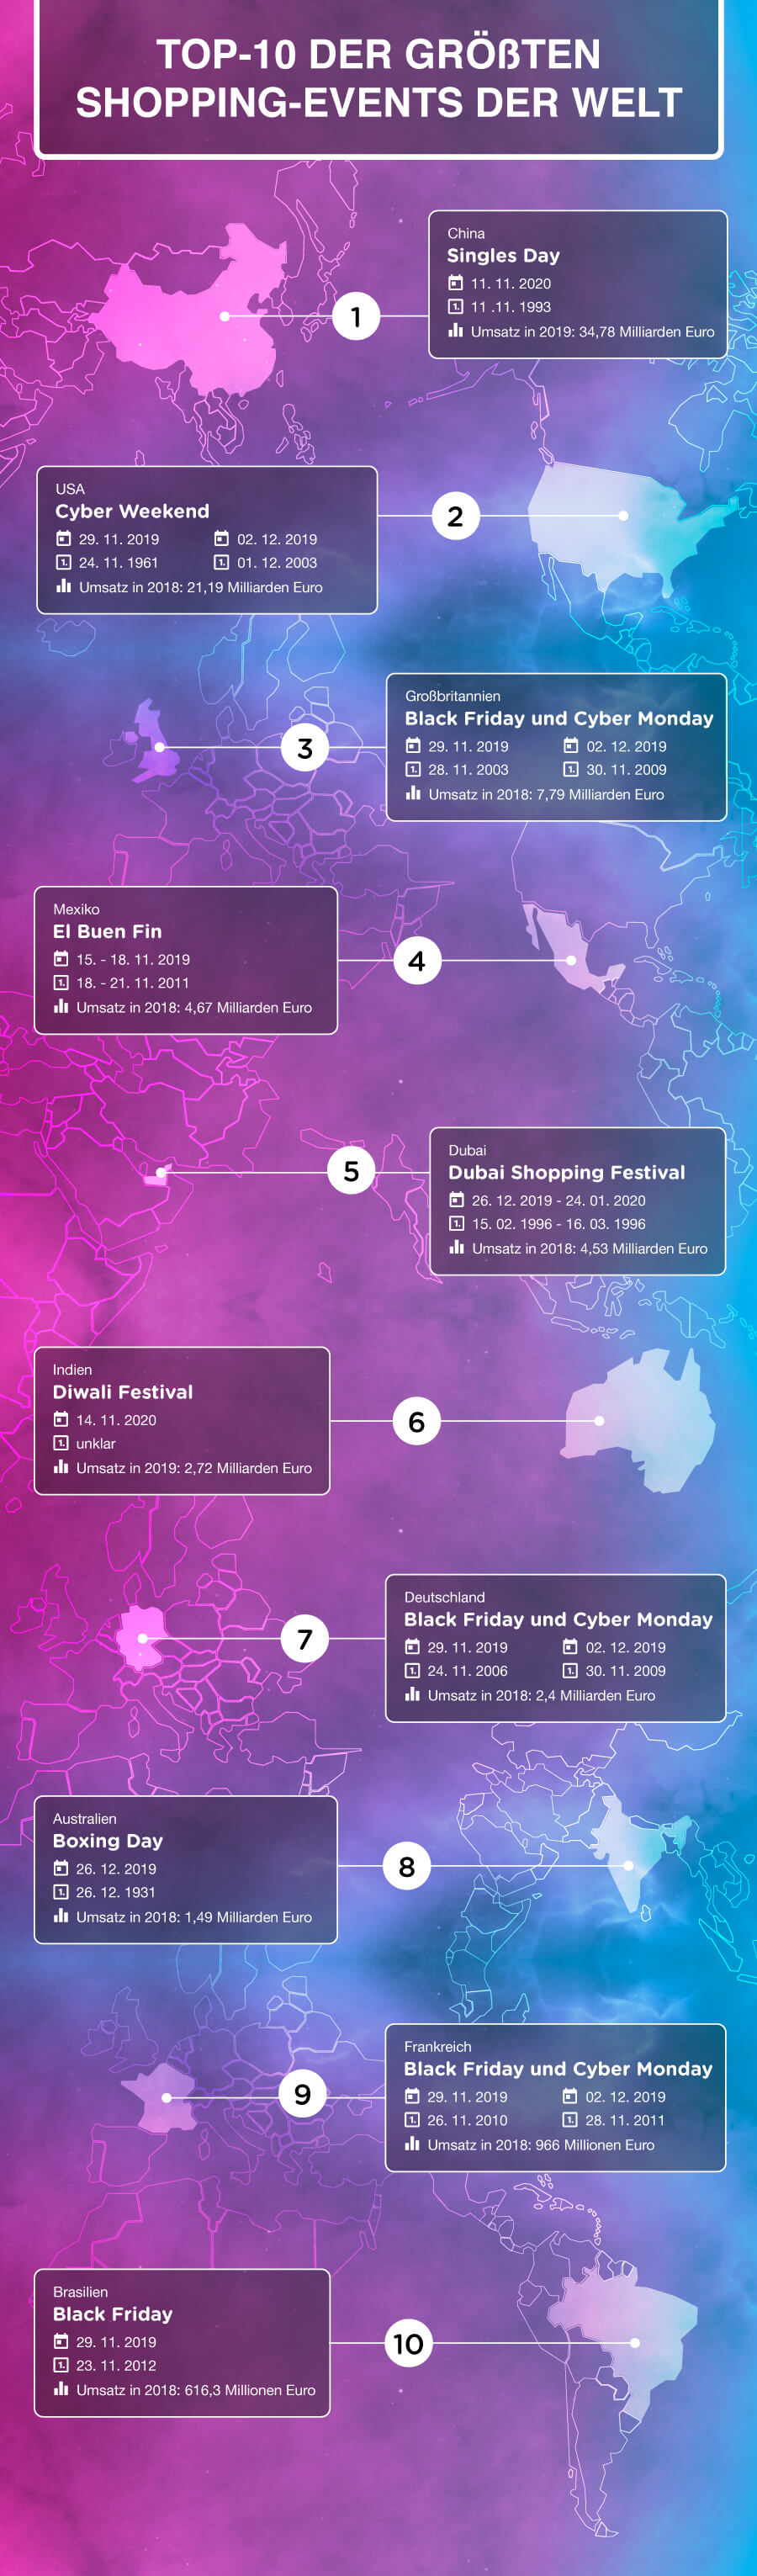 337785 infografik shopping events vertikal web c95d5f original 1573559921